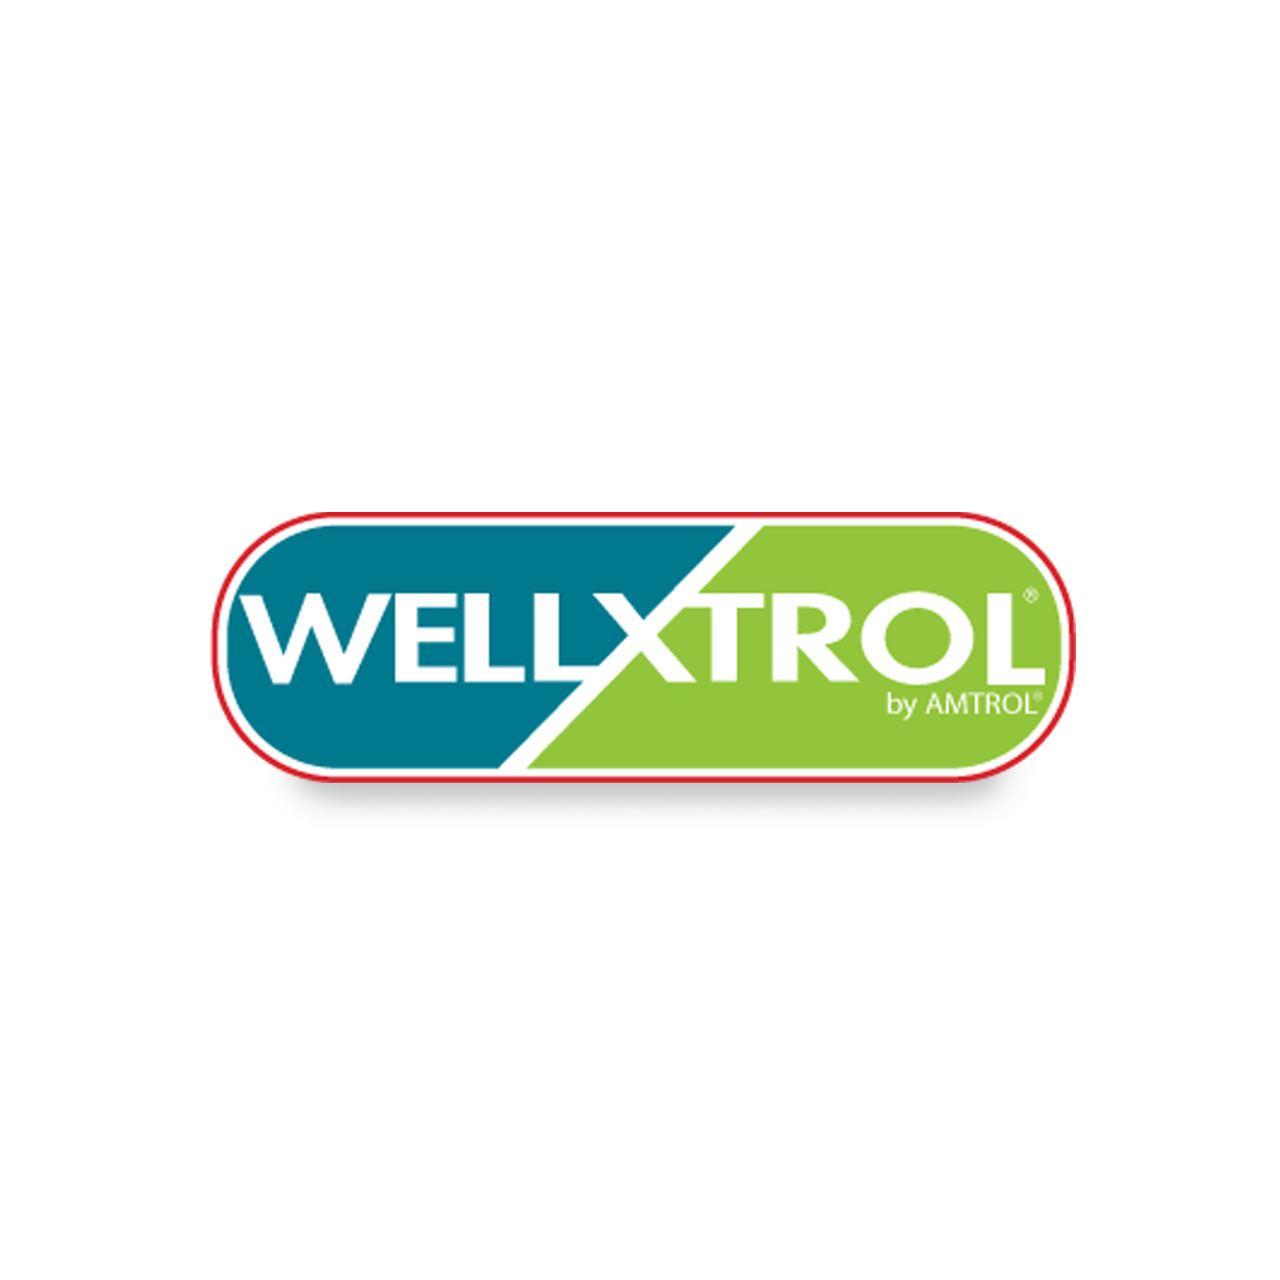 32 gallon well tank well x trol pre pressurized well tank Tjernlund Wiring Diagram prev next